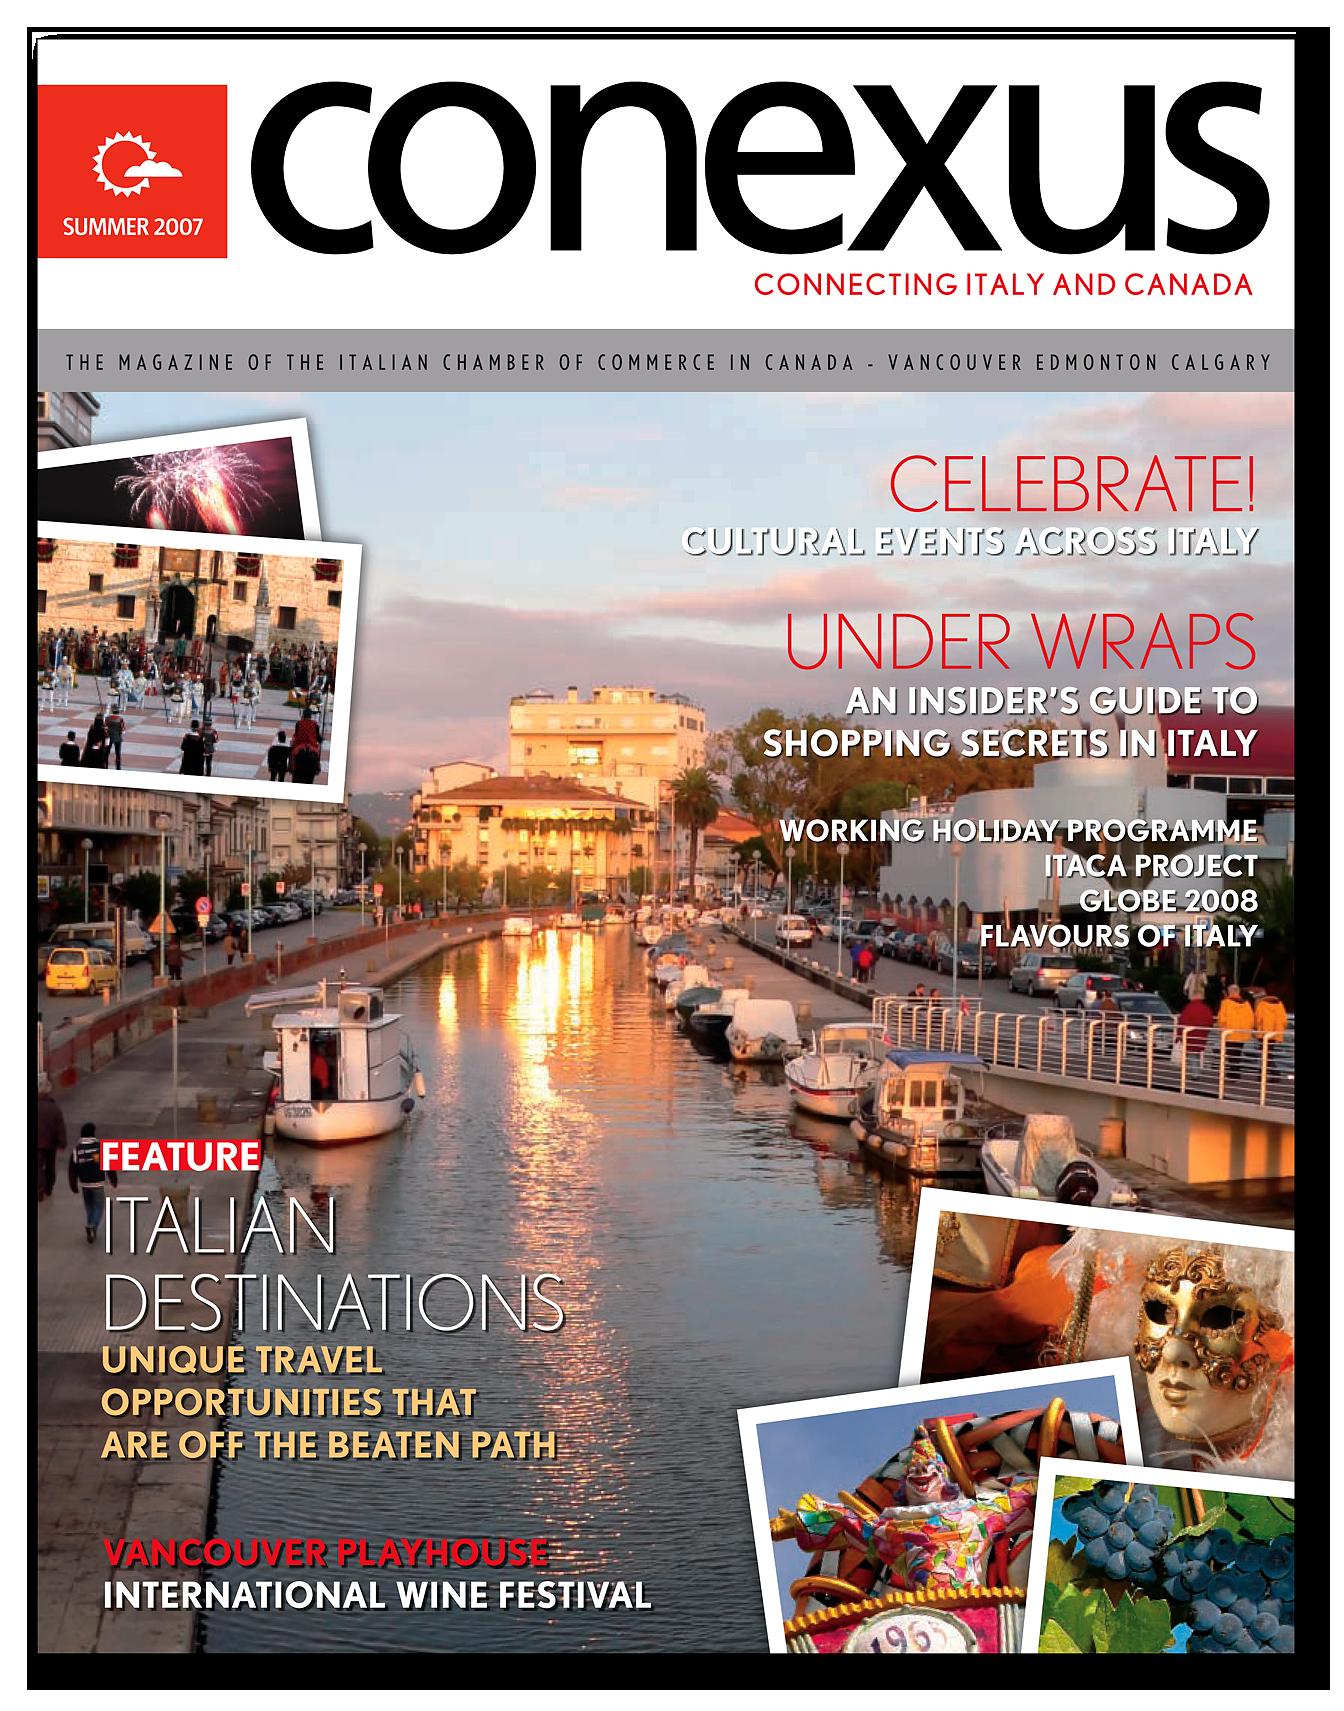 Conexus-Cover-03